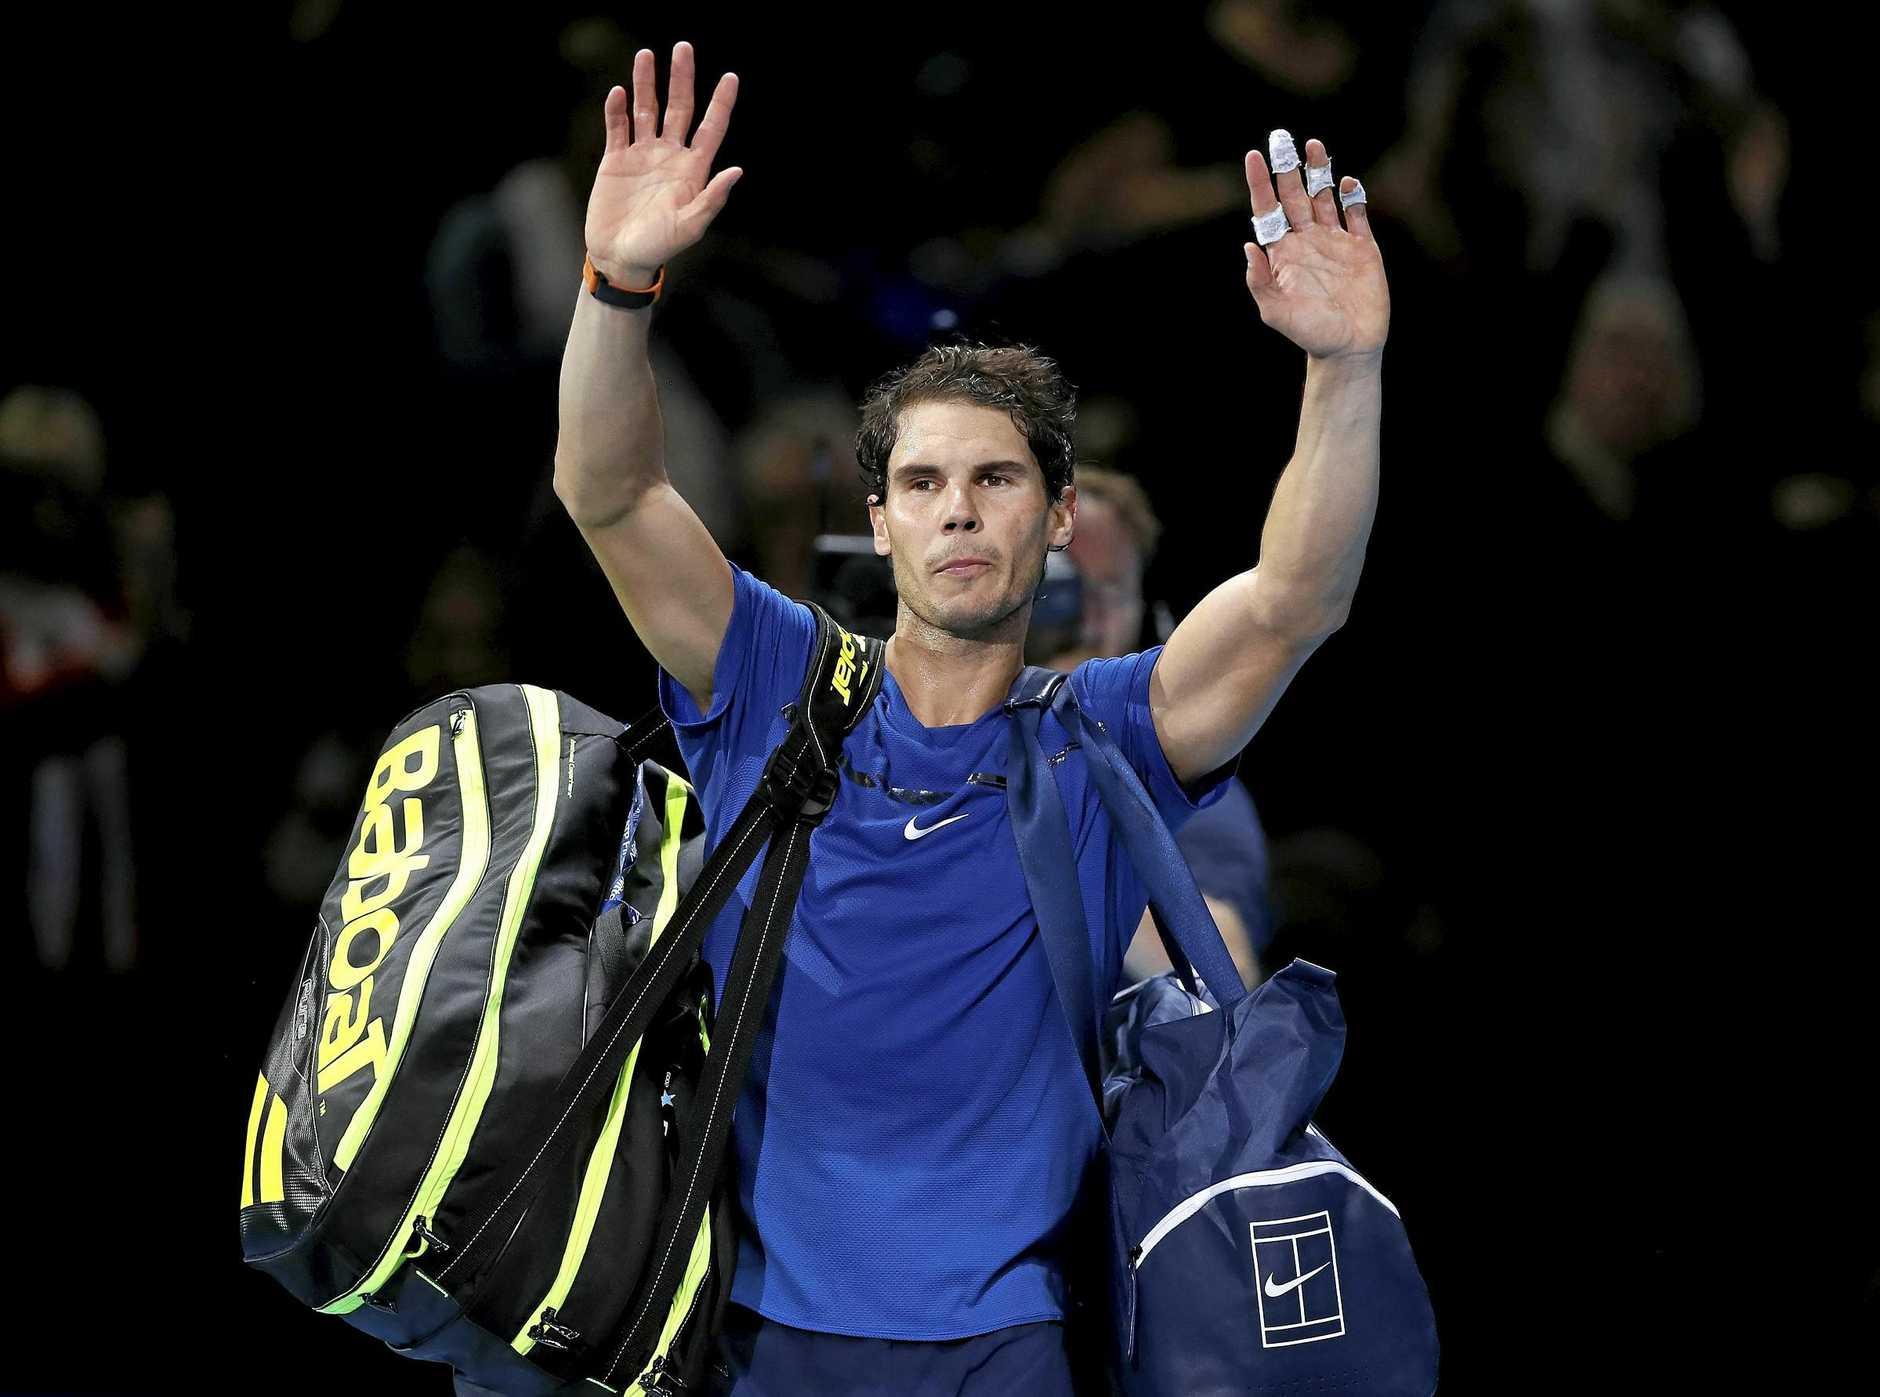 Spain's Rafael Nadal's season is over because of a knee injury